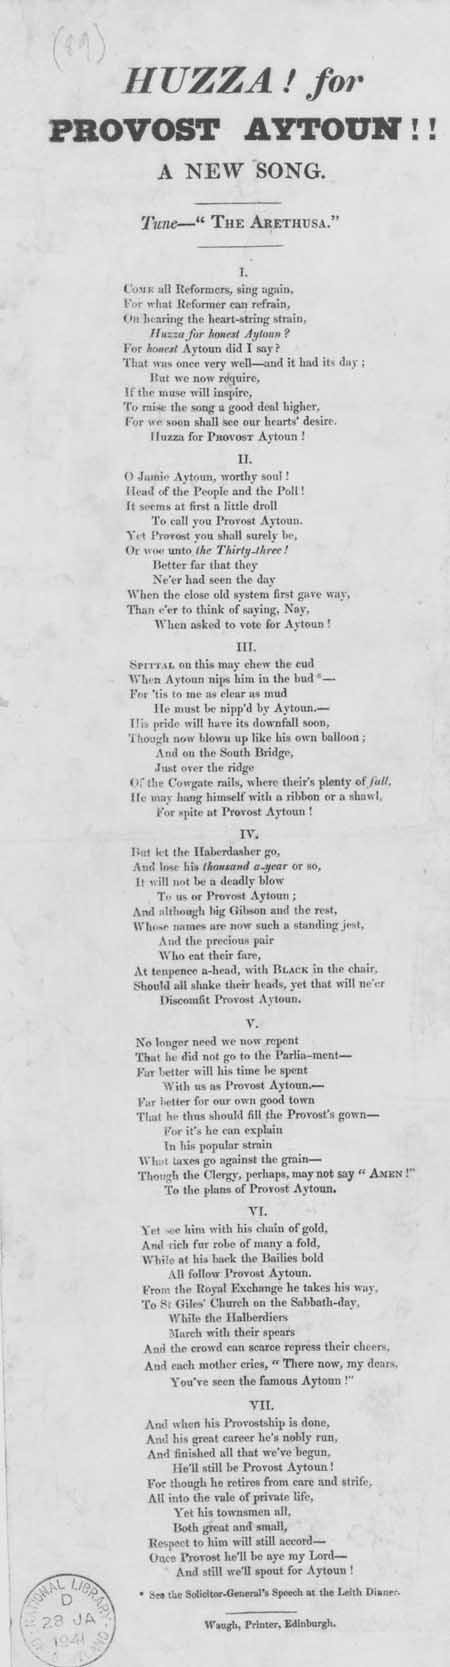 Broadside ballad entitled 'Huzza! for Provost Aytoun!! A New Song'